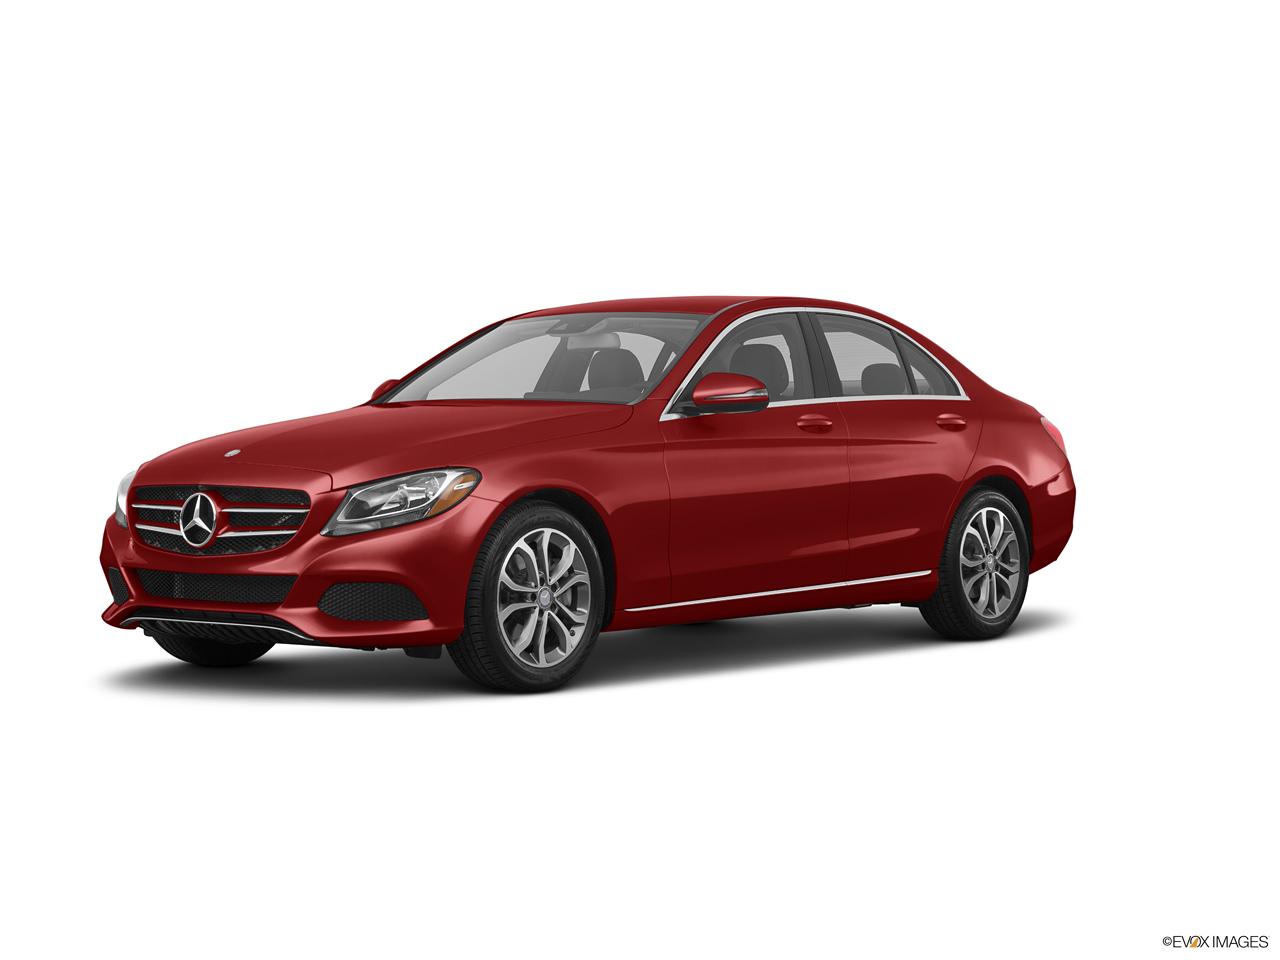 Car pictures list for mercedes benz c class 2017 c 400 for Mercedes benz car models list with pictures